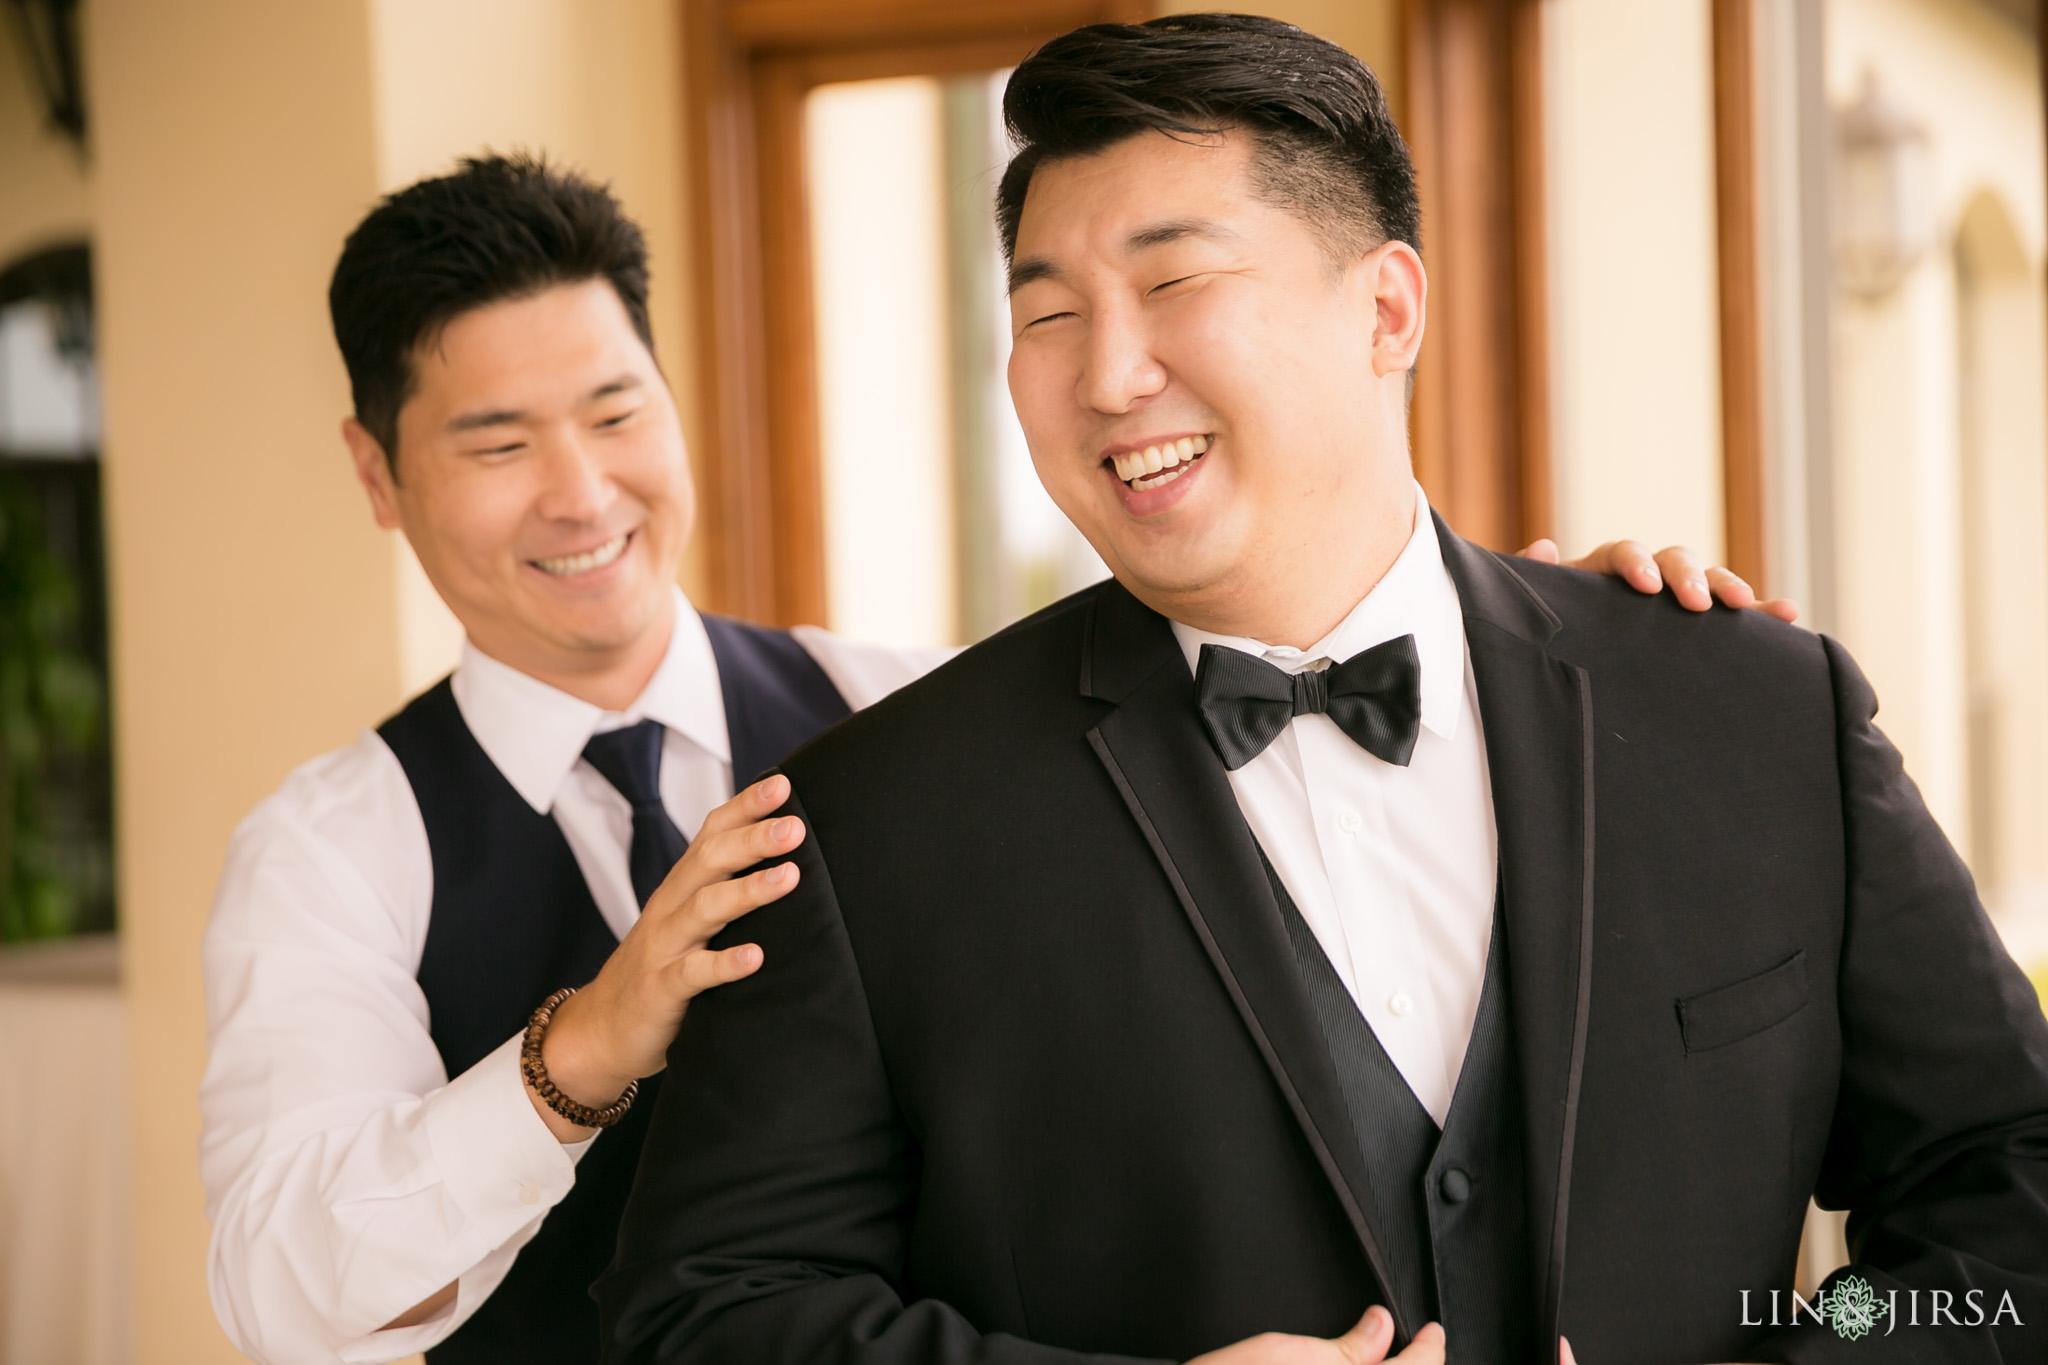 07 trump national golf club rancho palos verdes wedding groom photography